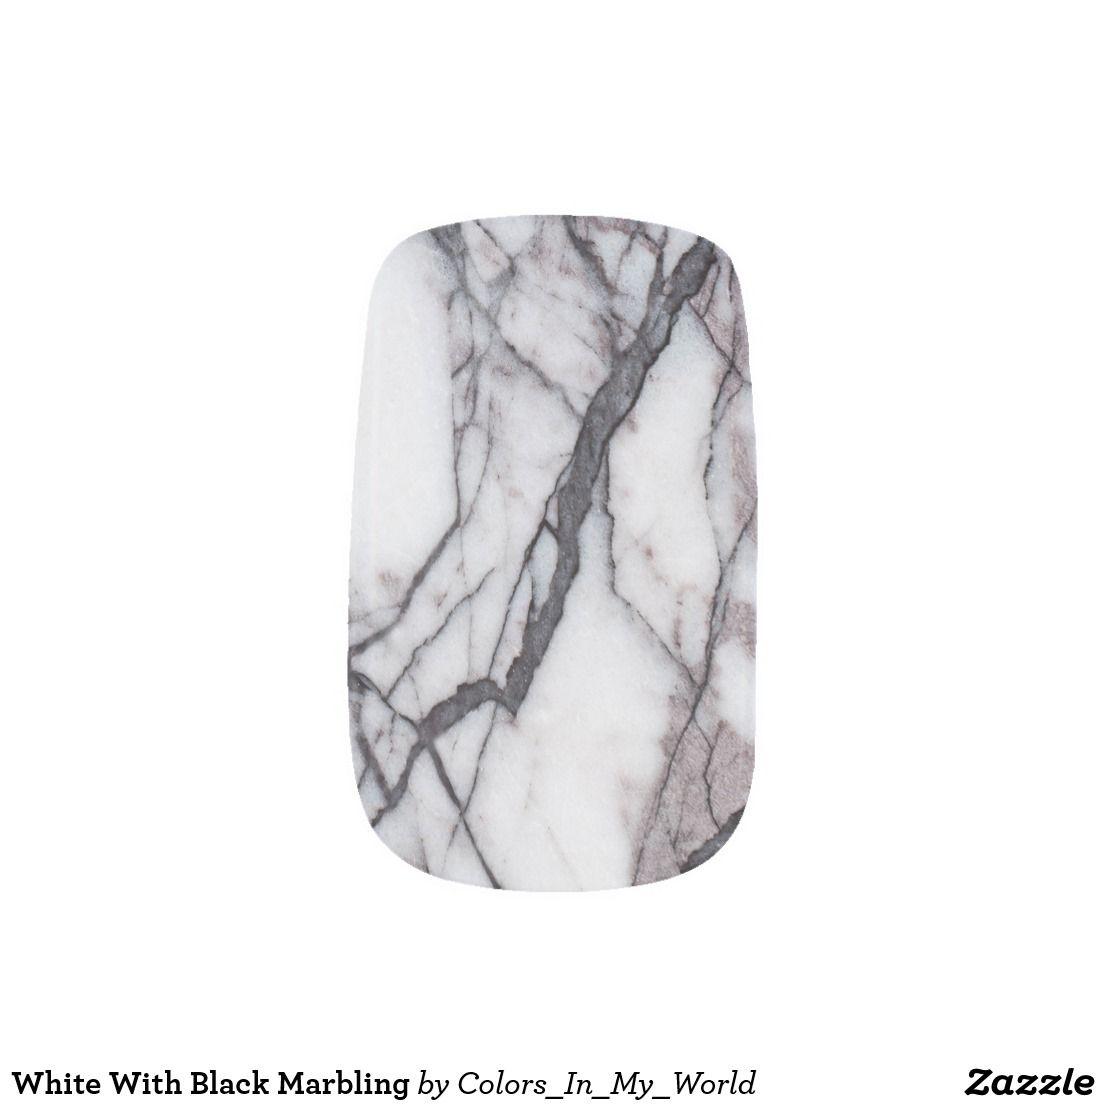 White With Black Marbling Minx Nail Art   Zazzle.com